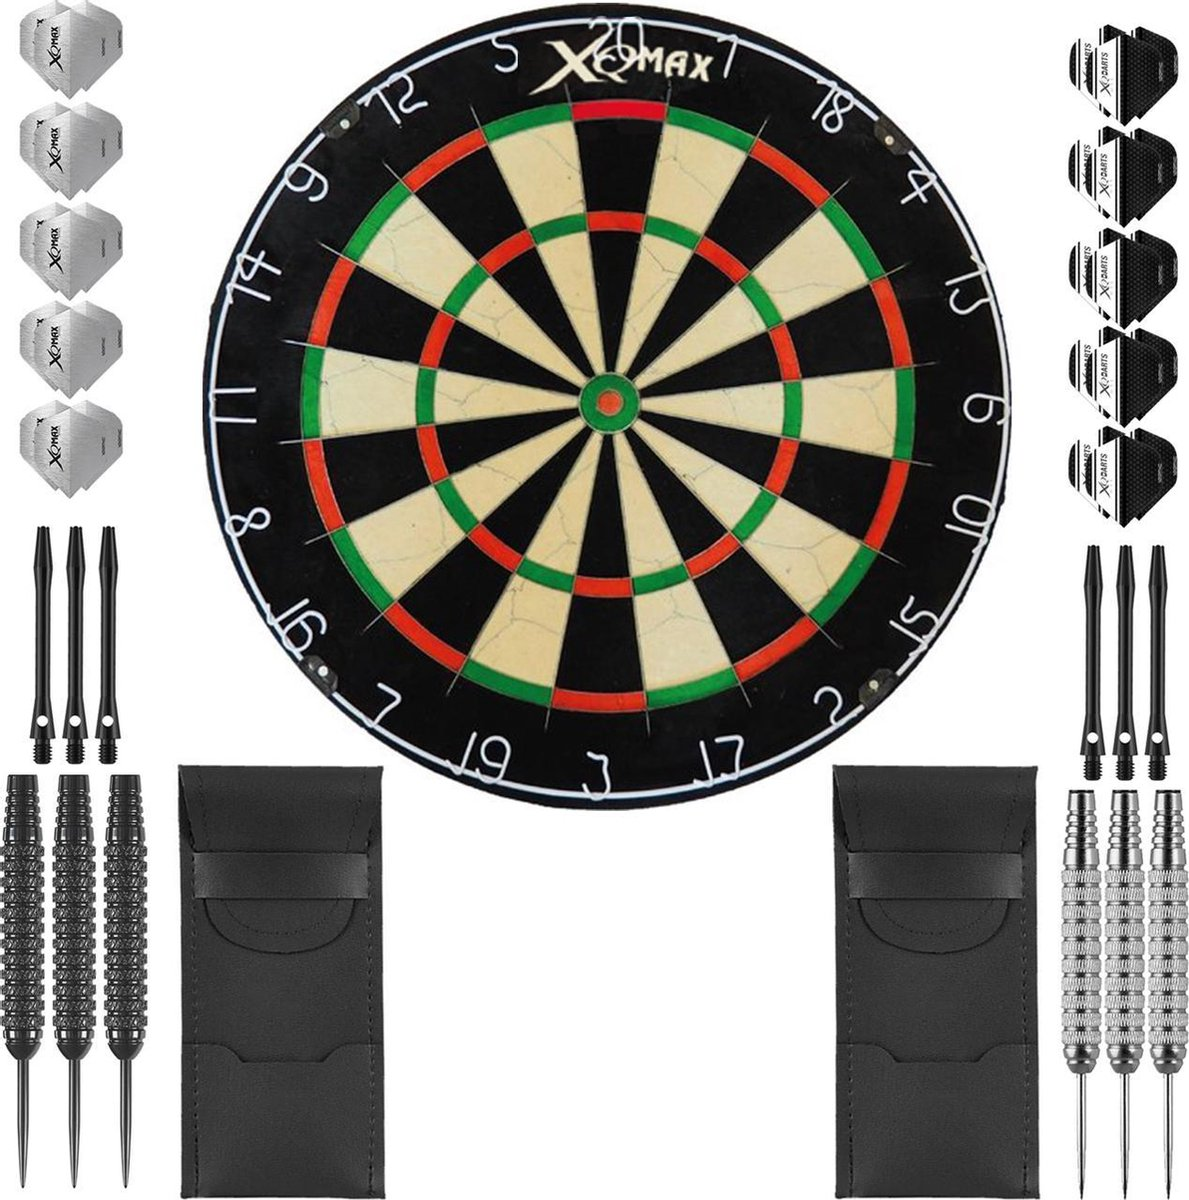 Dragon Darts complete Mega Ray dartset - XQ Max dartbord - dart shafts - dart flights - dartpijlen 24 gram - 100% brass - 2 sets - dartpijlen